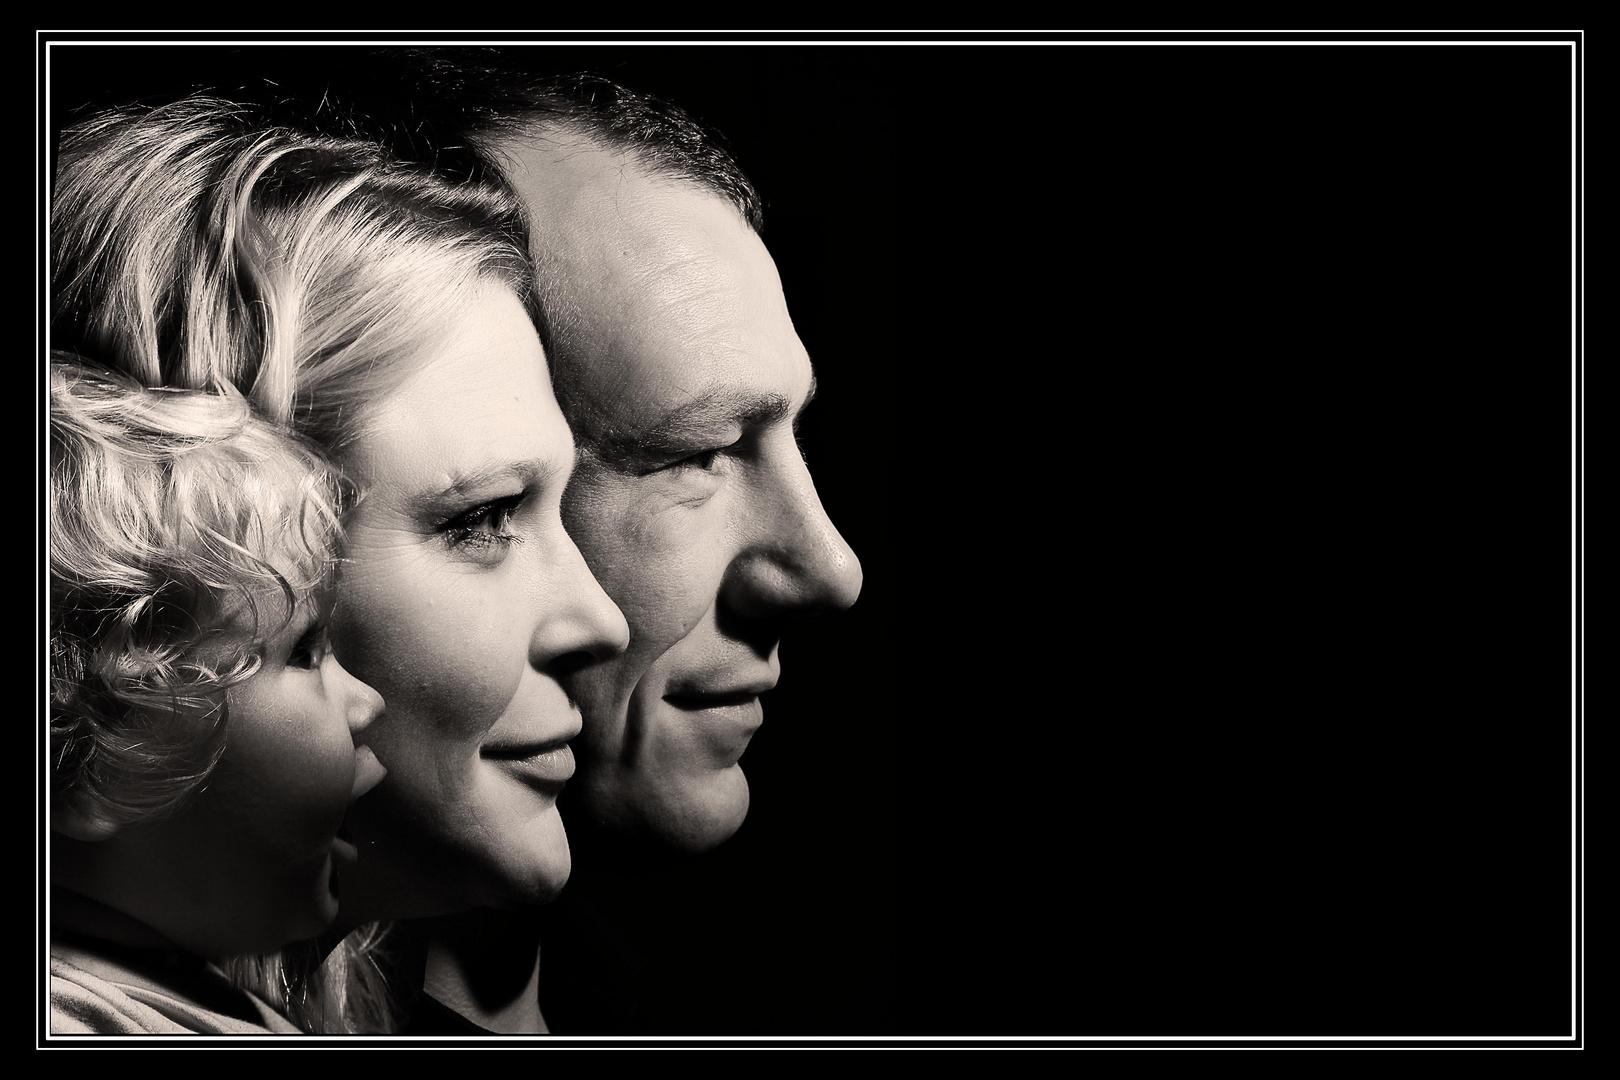 Family ....